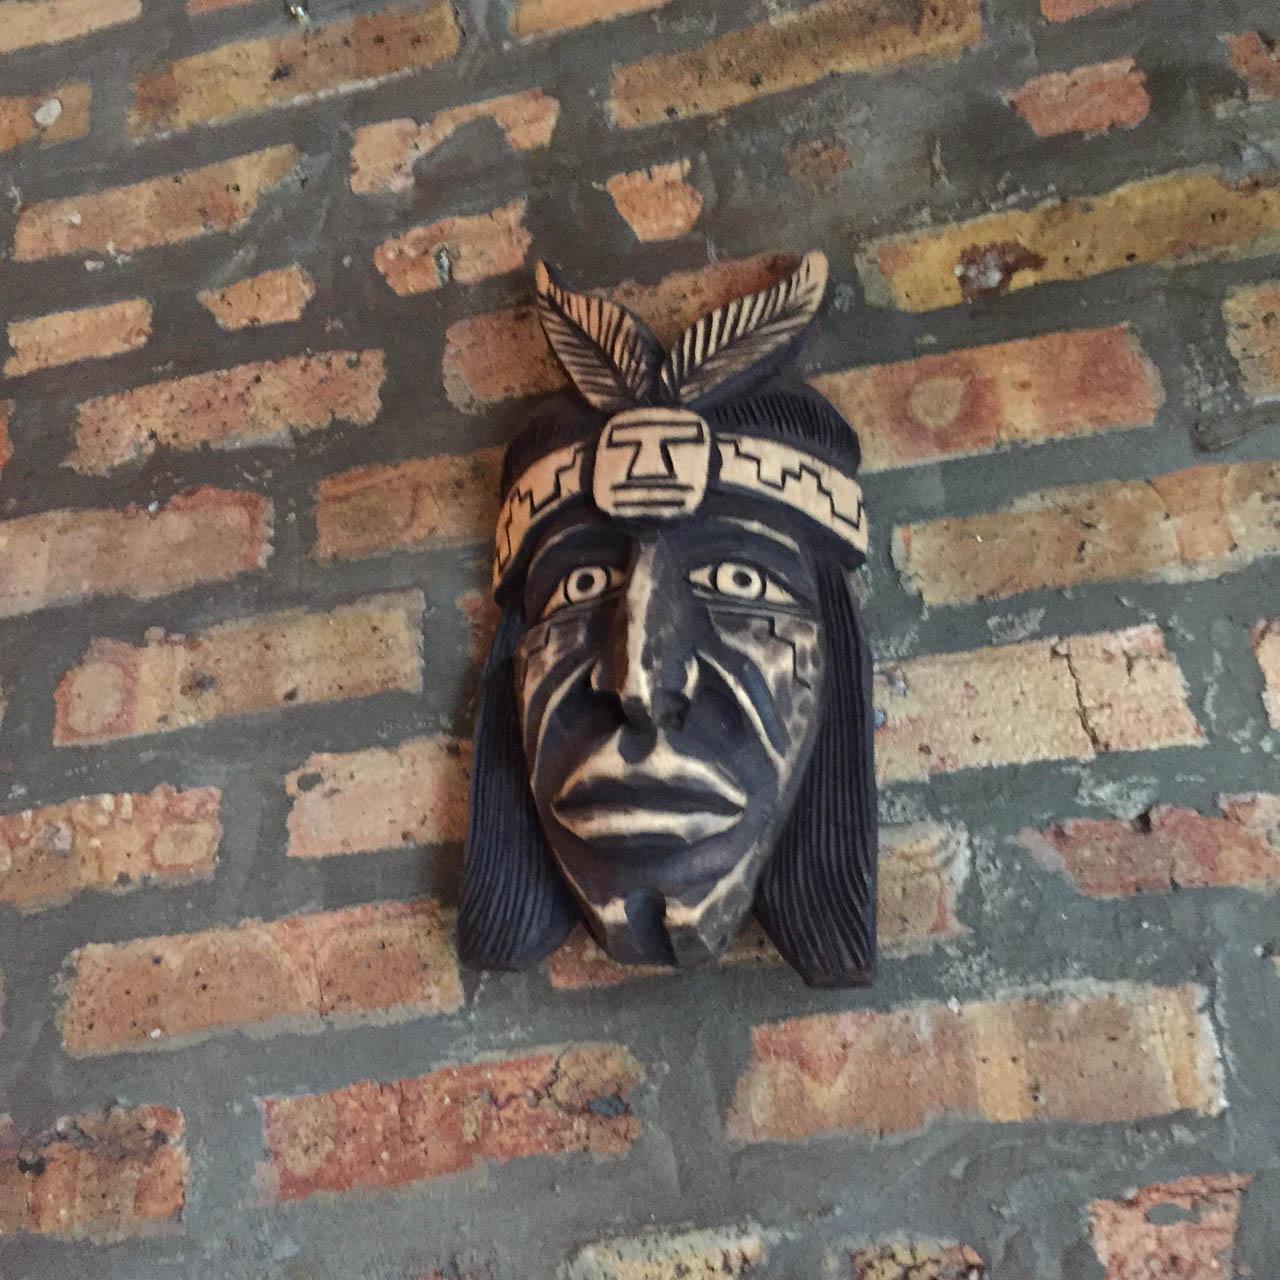 Ceviche Peruvian Restaurant Artwork